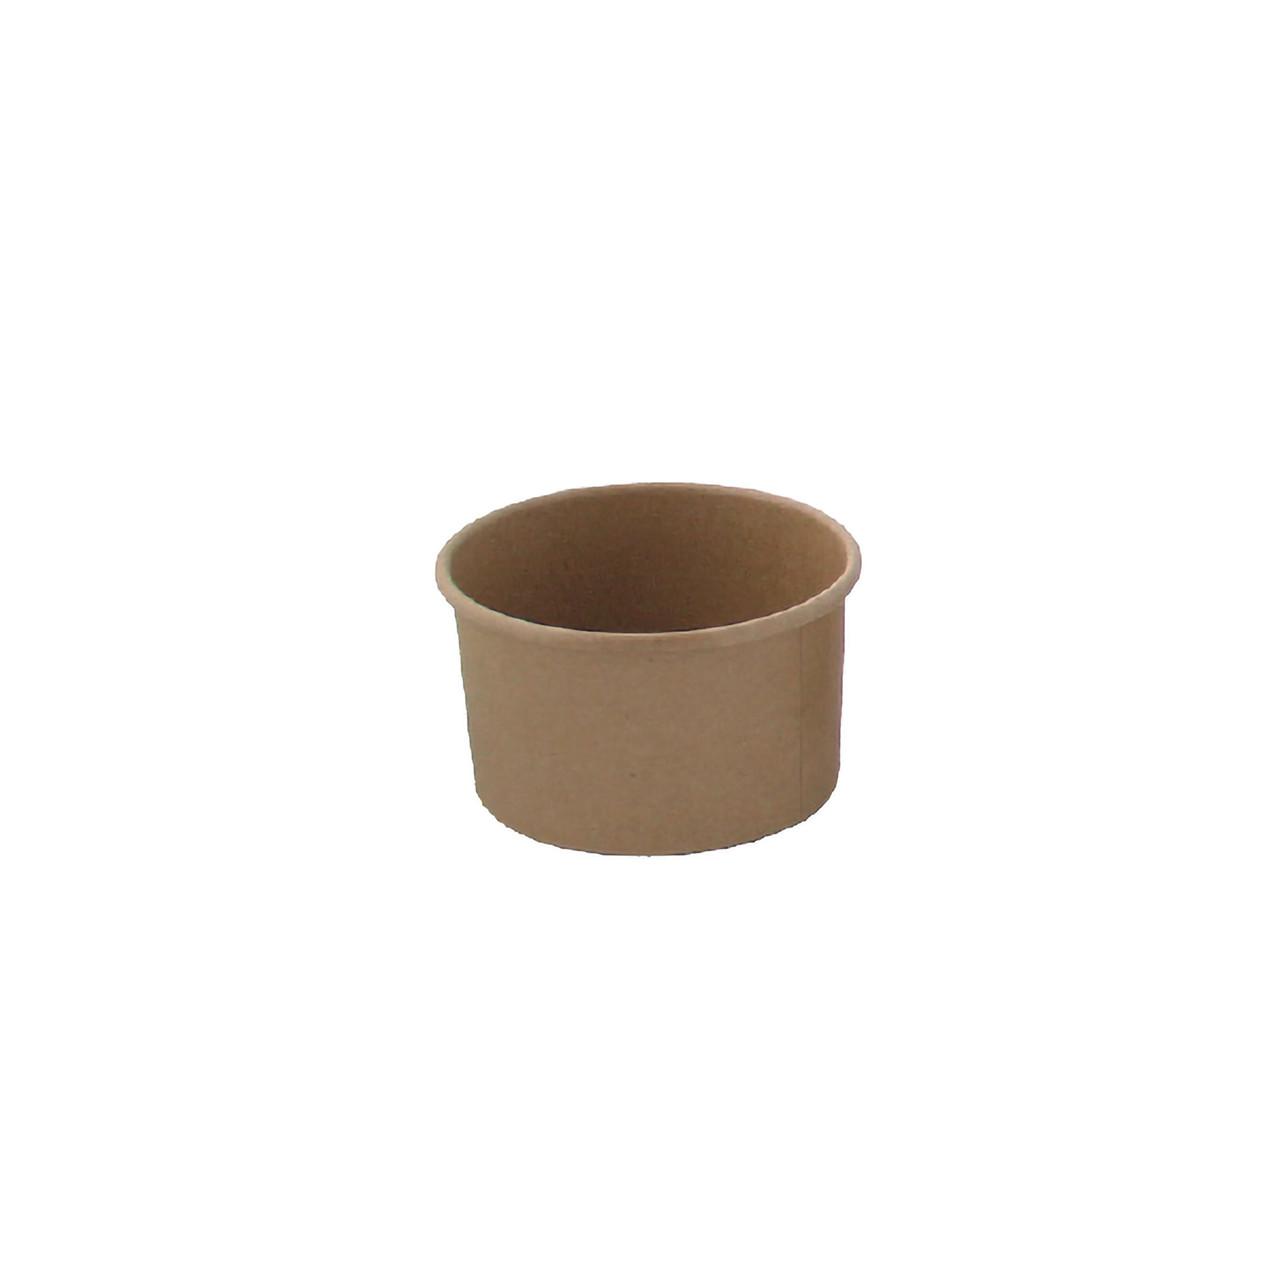 Brown Kraft Hot & Cold Paper Cup -4.2oz Dia:2.9in H:1.95in